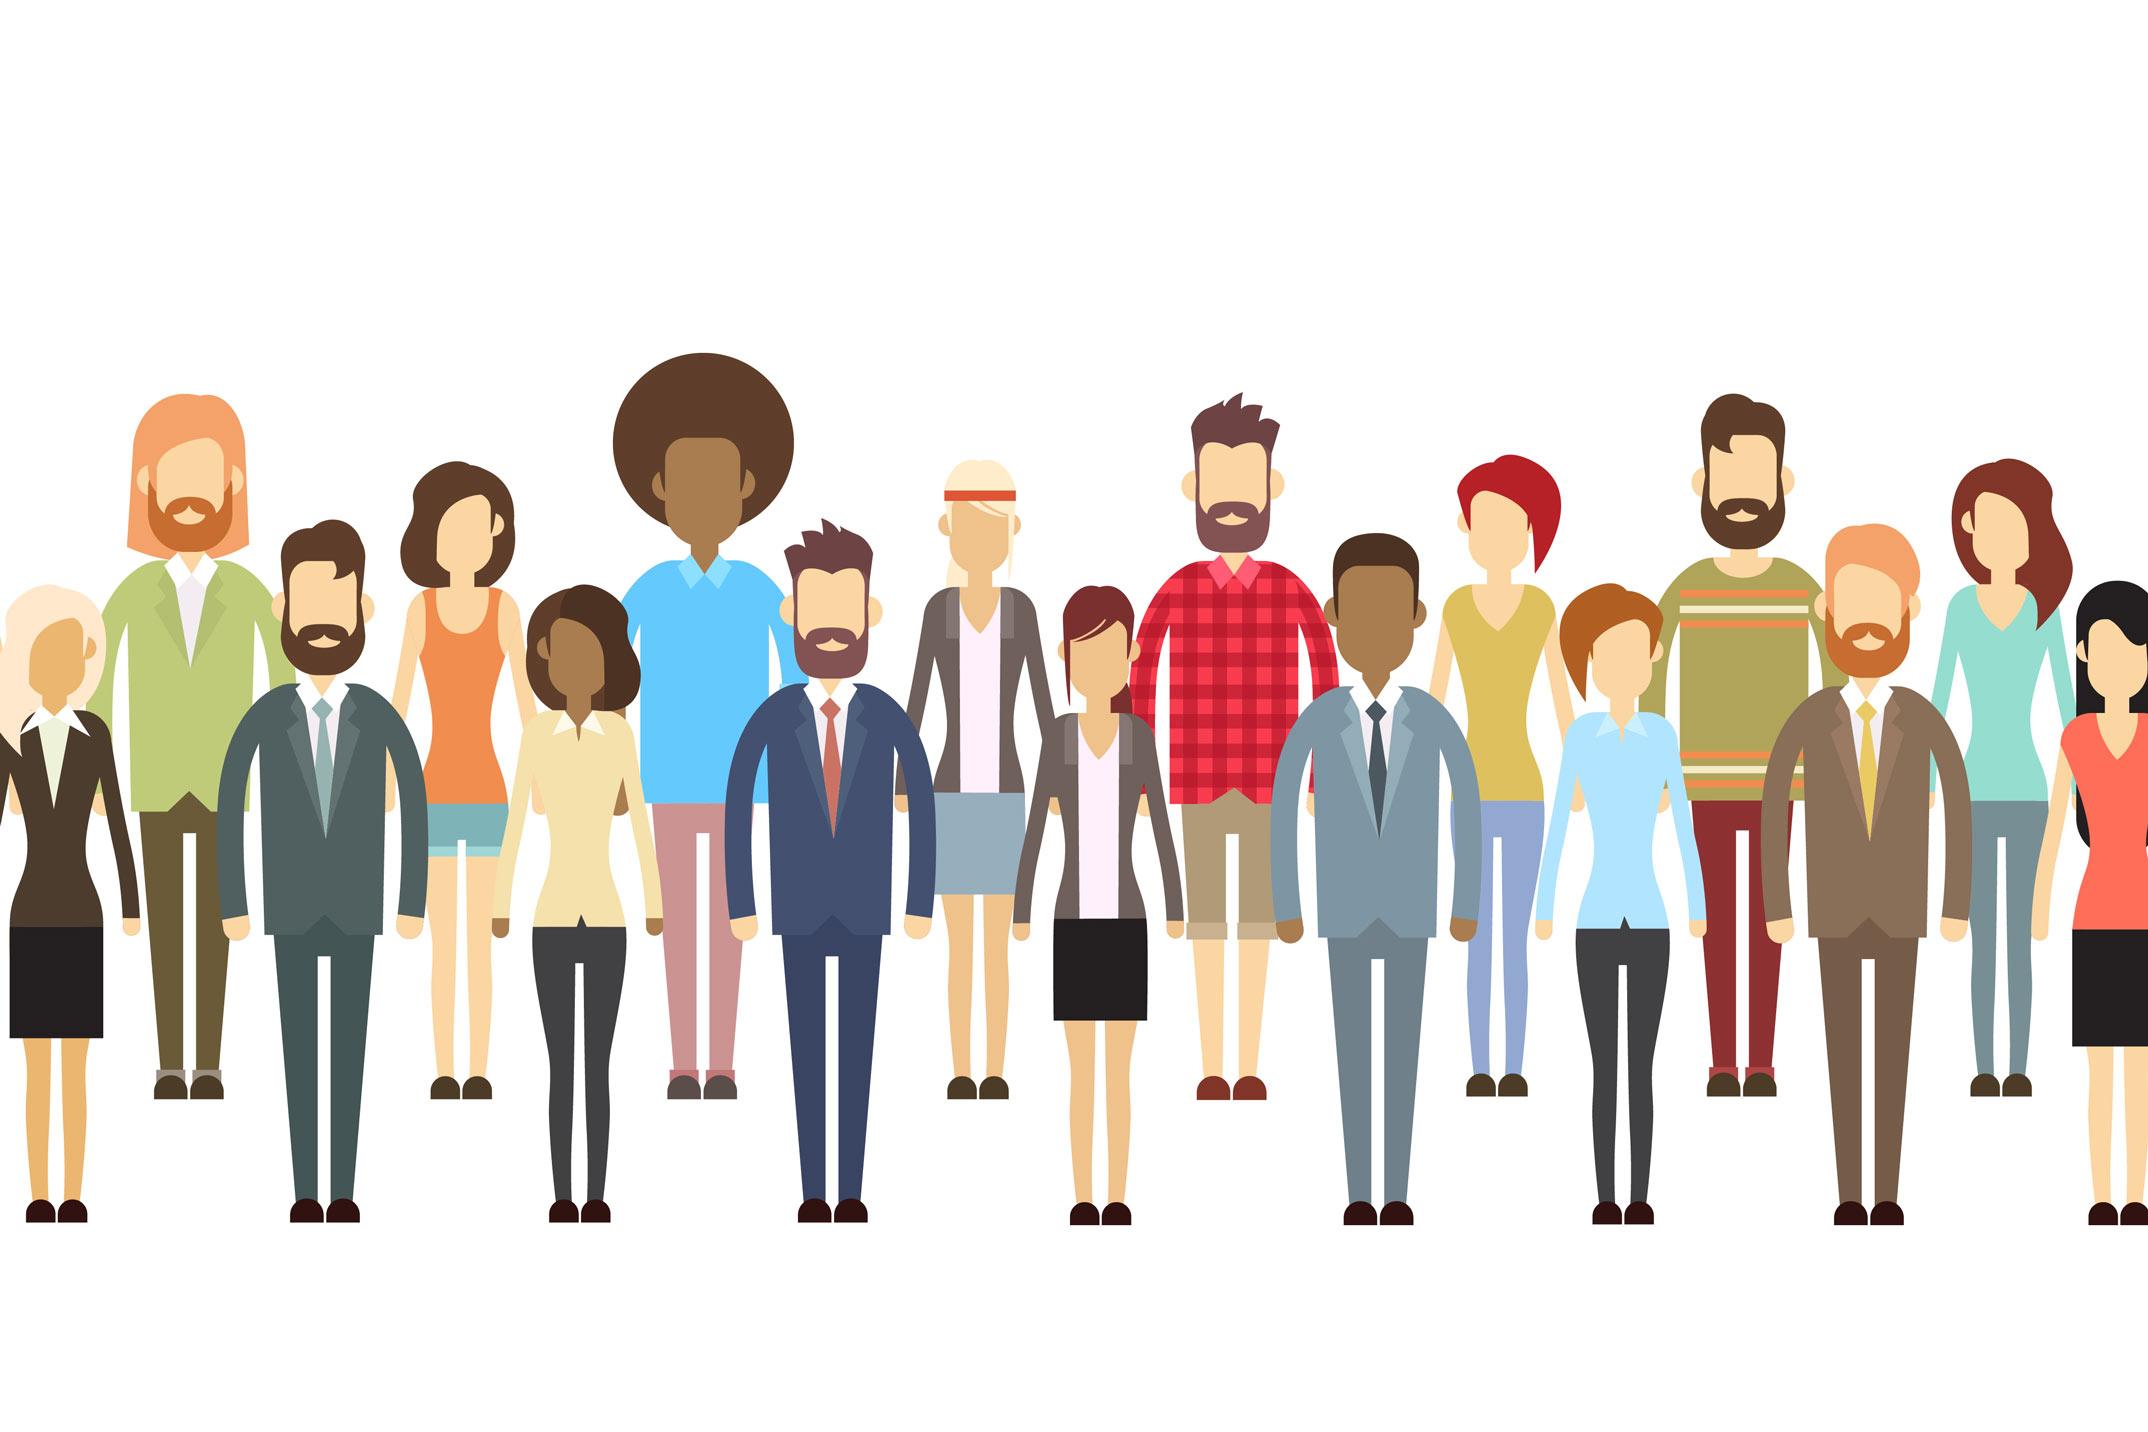 Values Matter, Demographics Don't